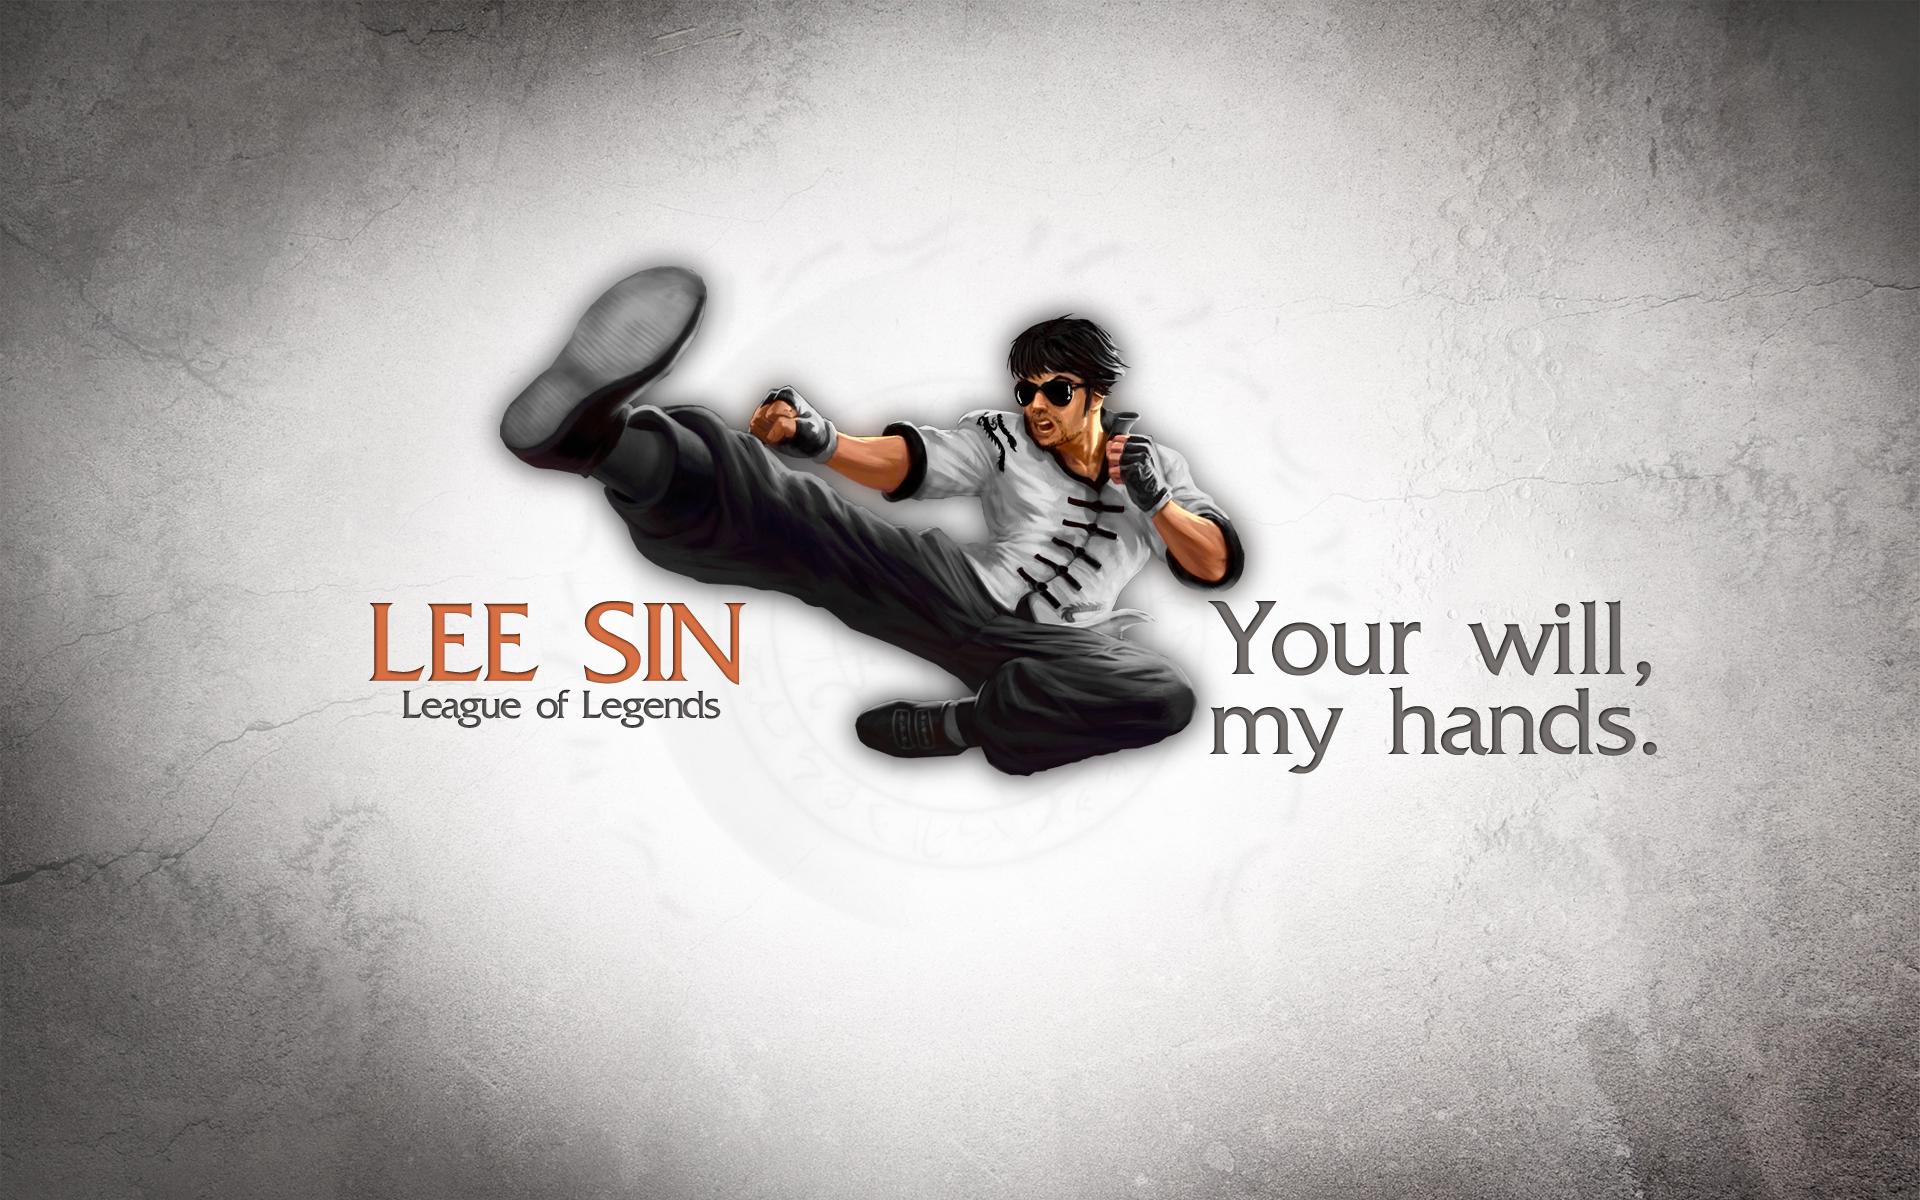 League of Legends wallpaper 175